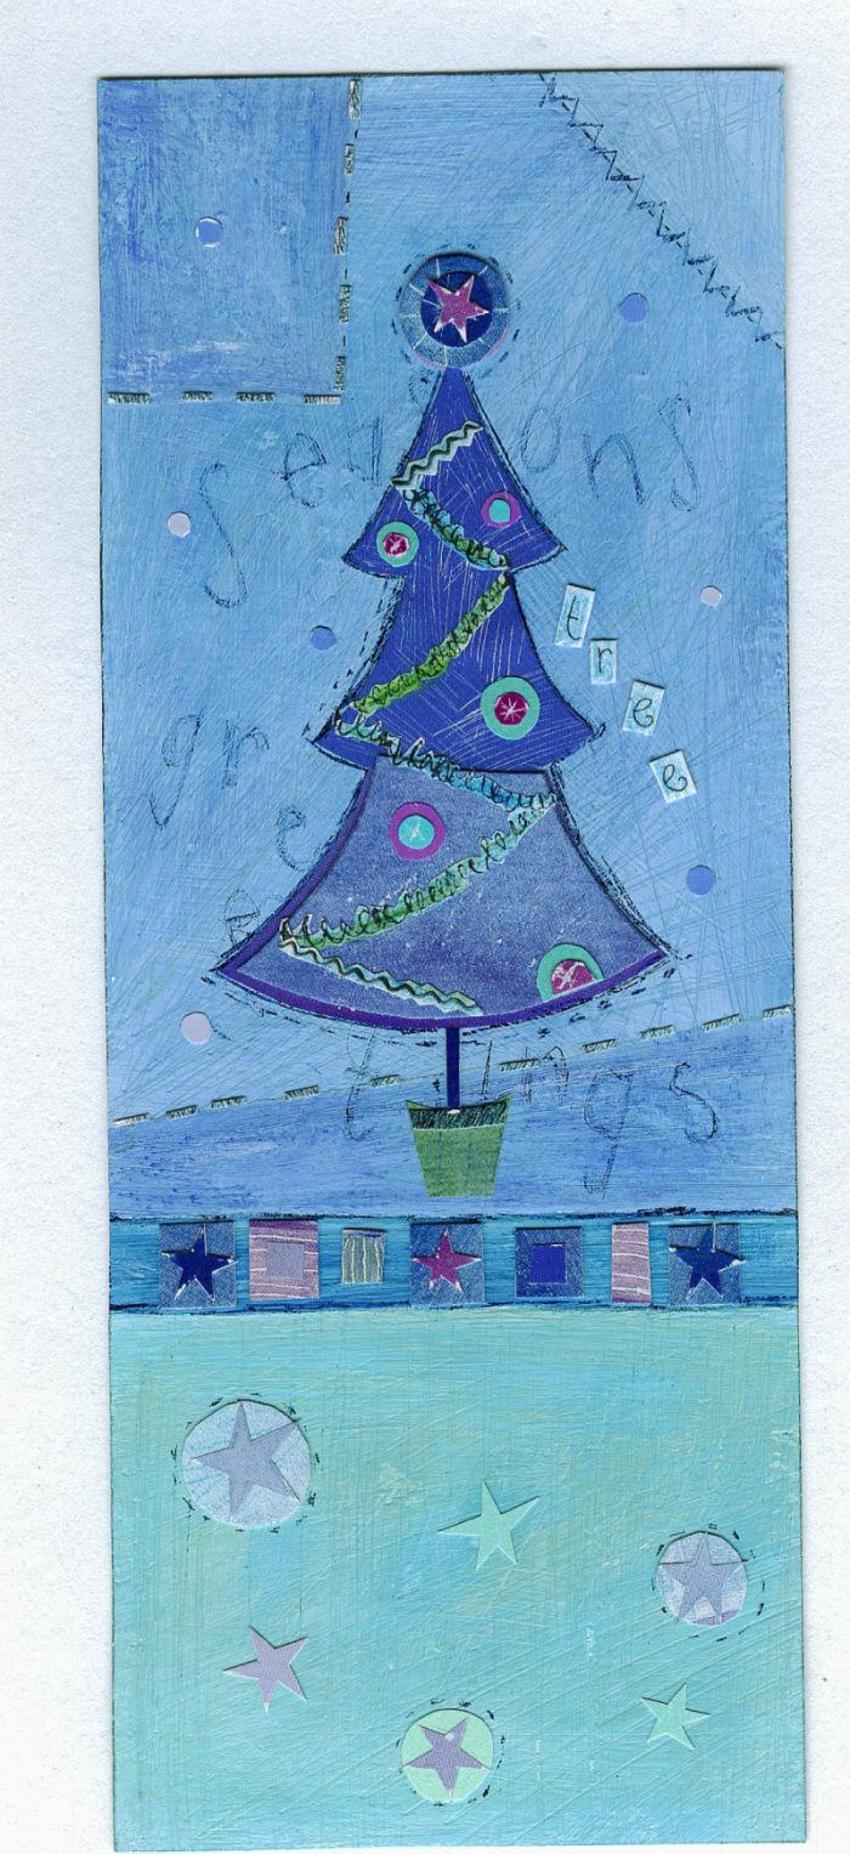 PT BLUE XMAS TREE.jpg